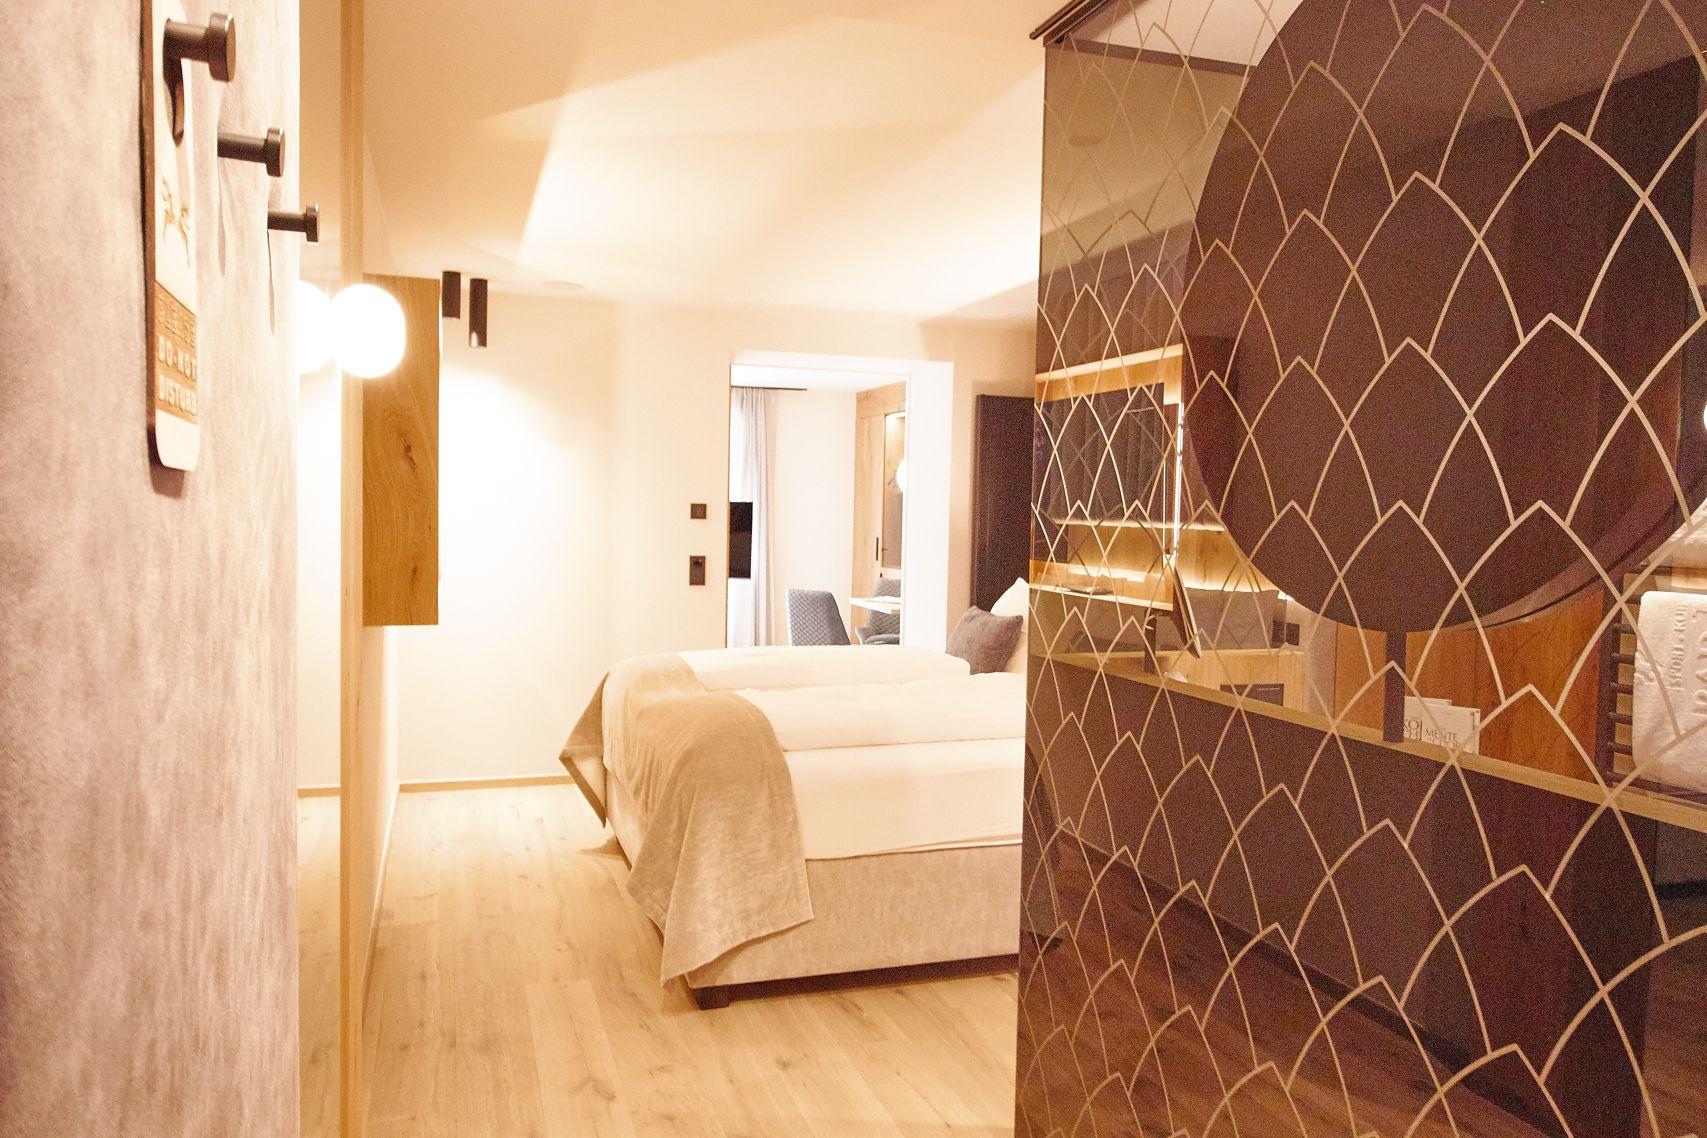 Hotelzimmer im Bad Moos Dolomites Spa Resort in Sexten